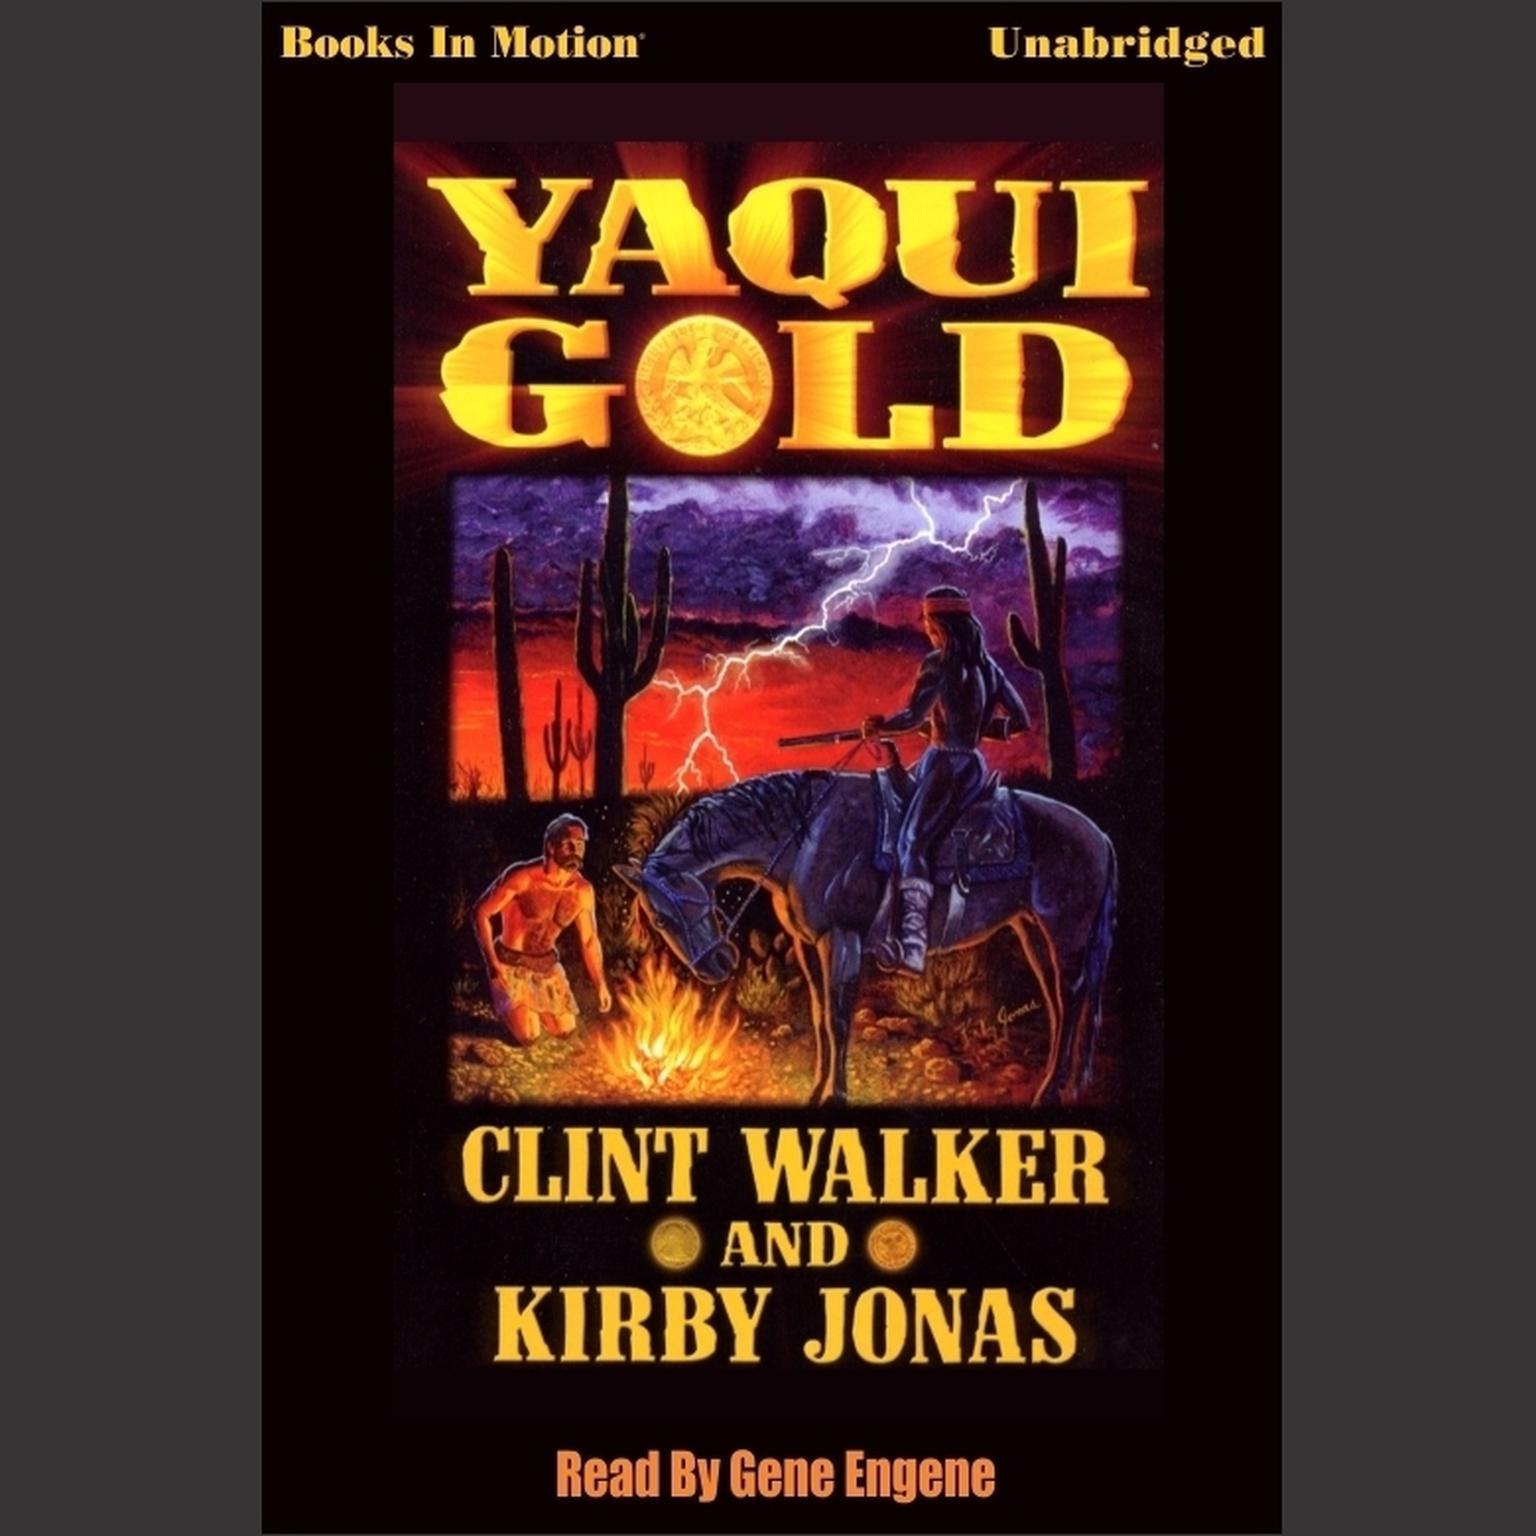 Yaqui Gold Audiobook, by Clint Walker